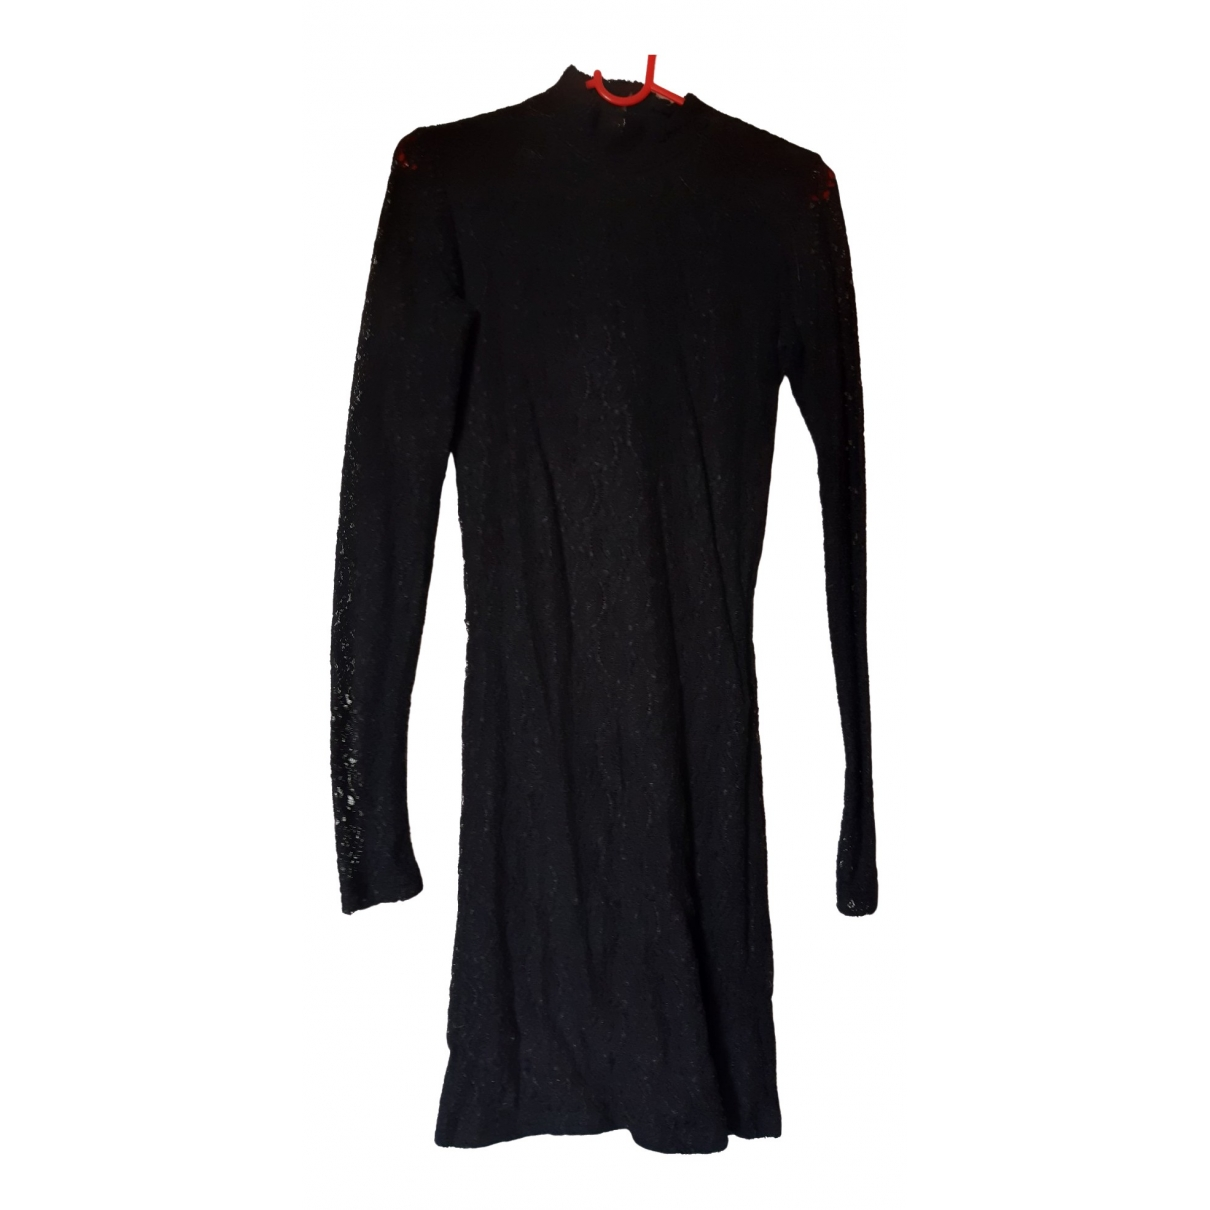 Ichi \N Kleid in  Schwarz Baumwolle - Elasthan